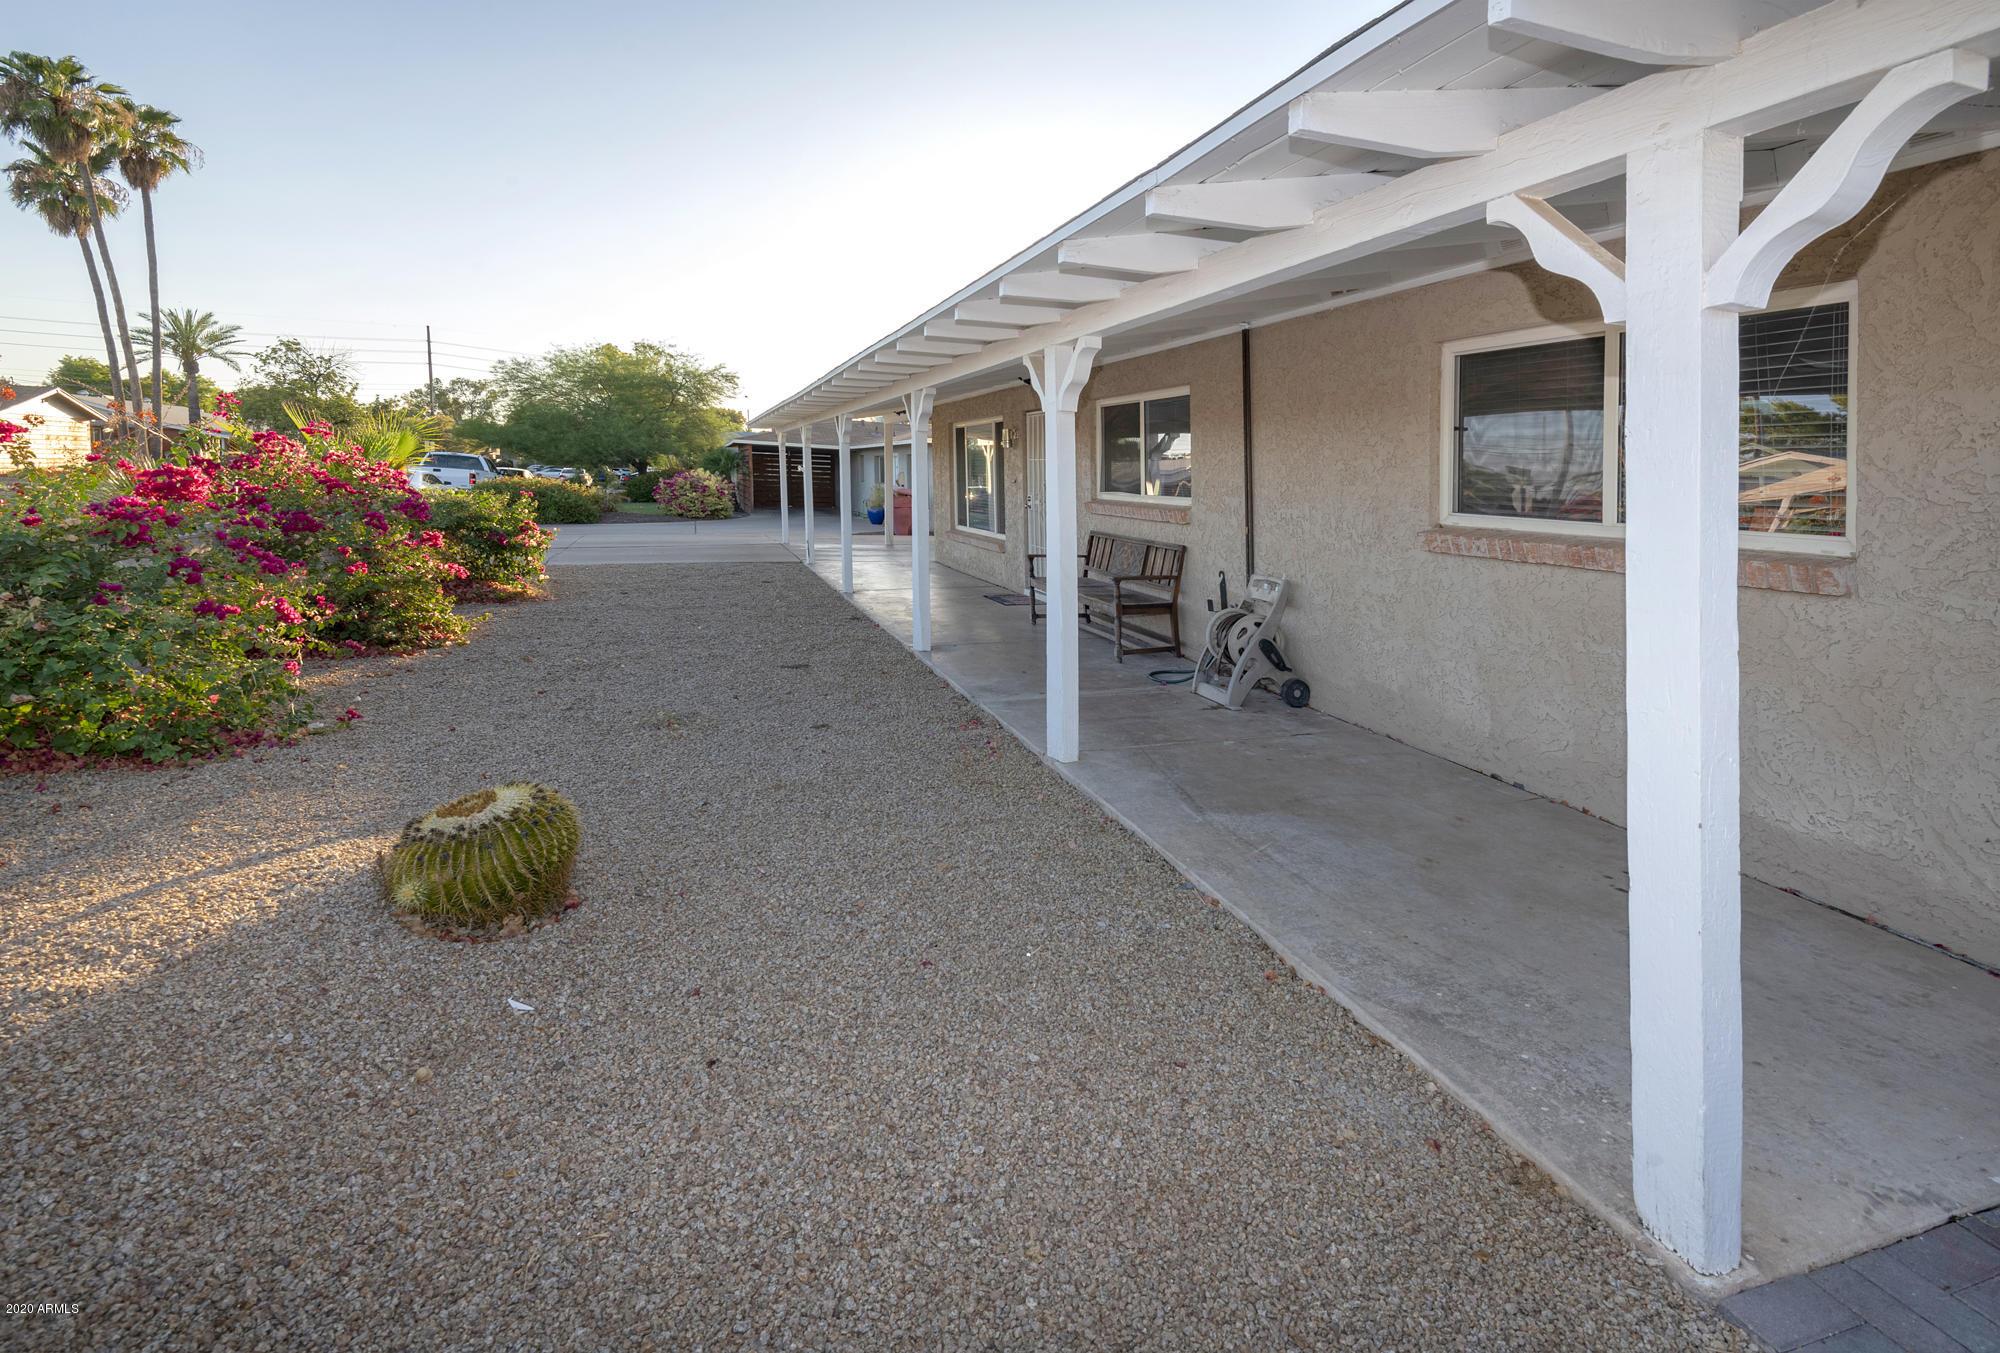 MLS 6101940 8026 E FAIRMOUNT Avenue, Scottsdale, AZ 85251 Scottsdale AZ Scottsdale Estates